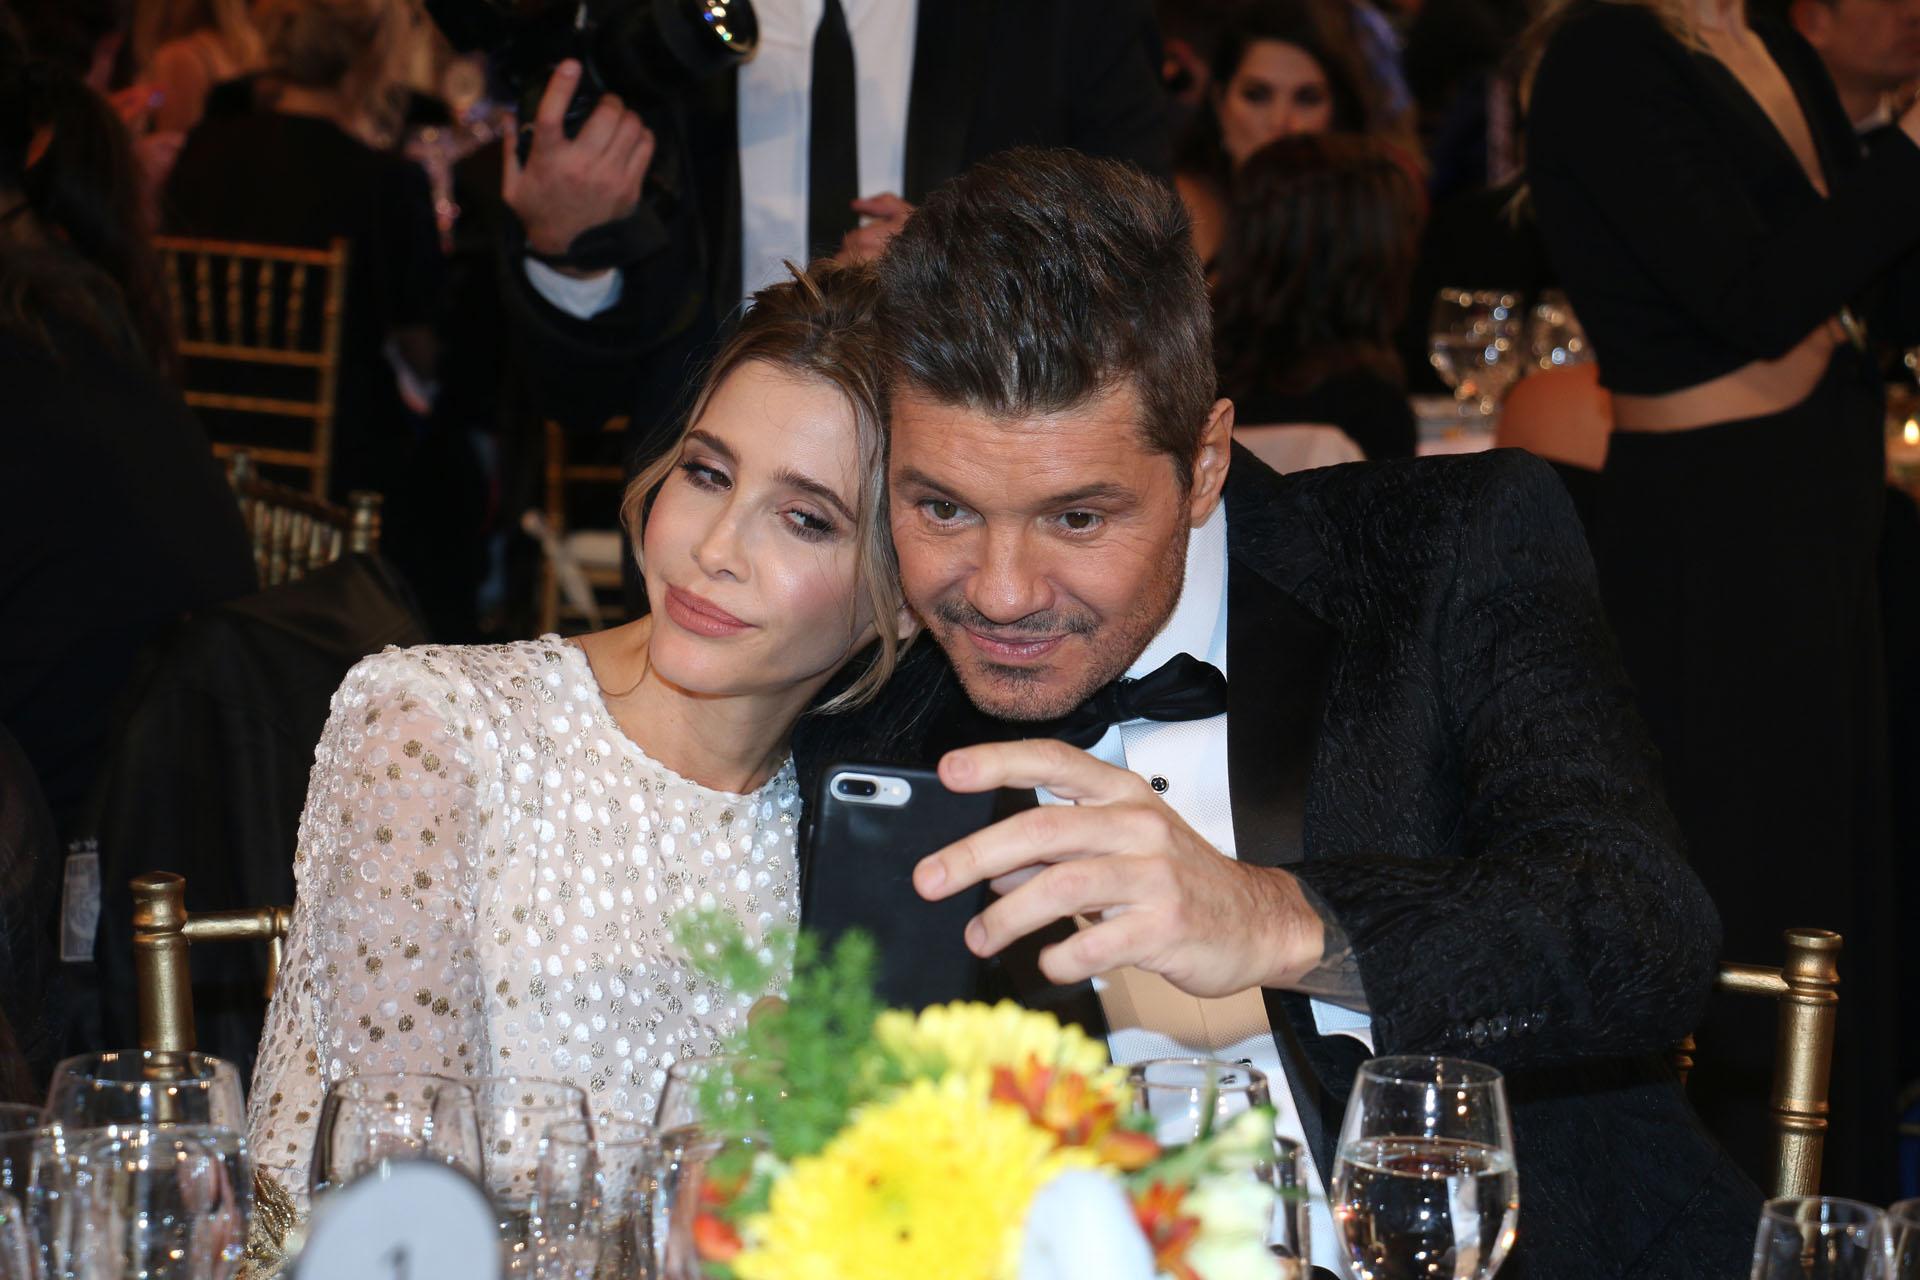 La selfie de Marcelo Tinelli y Guillermina Valdes